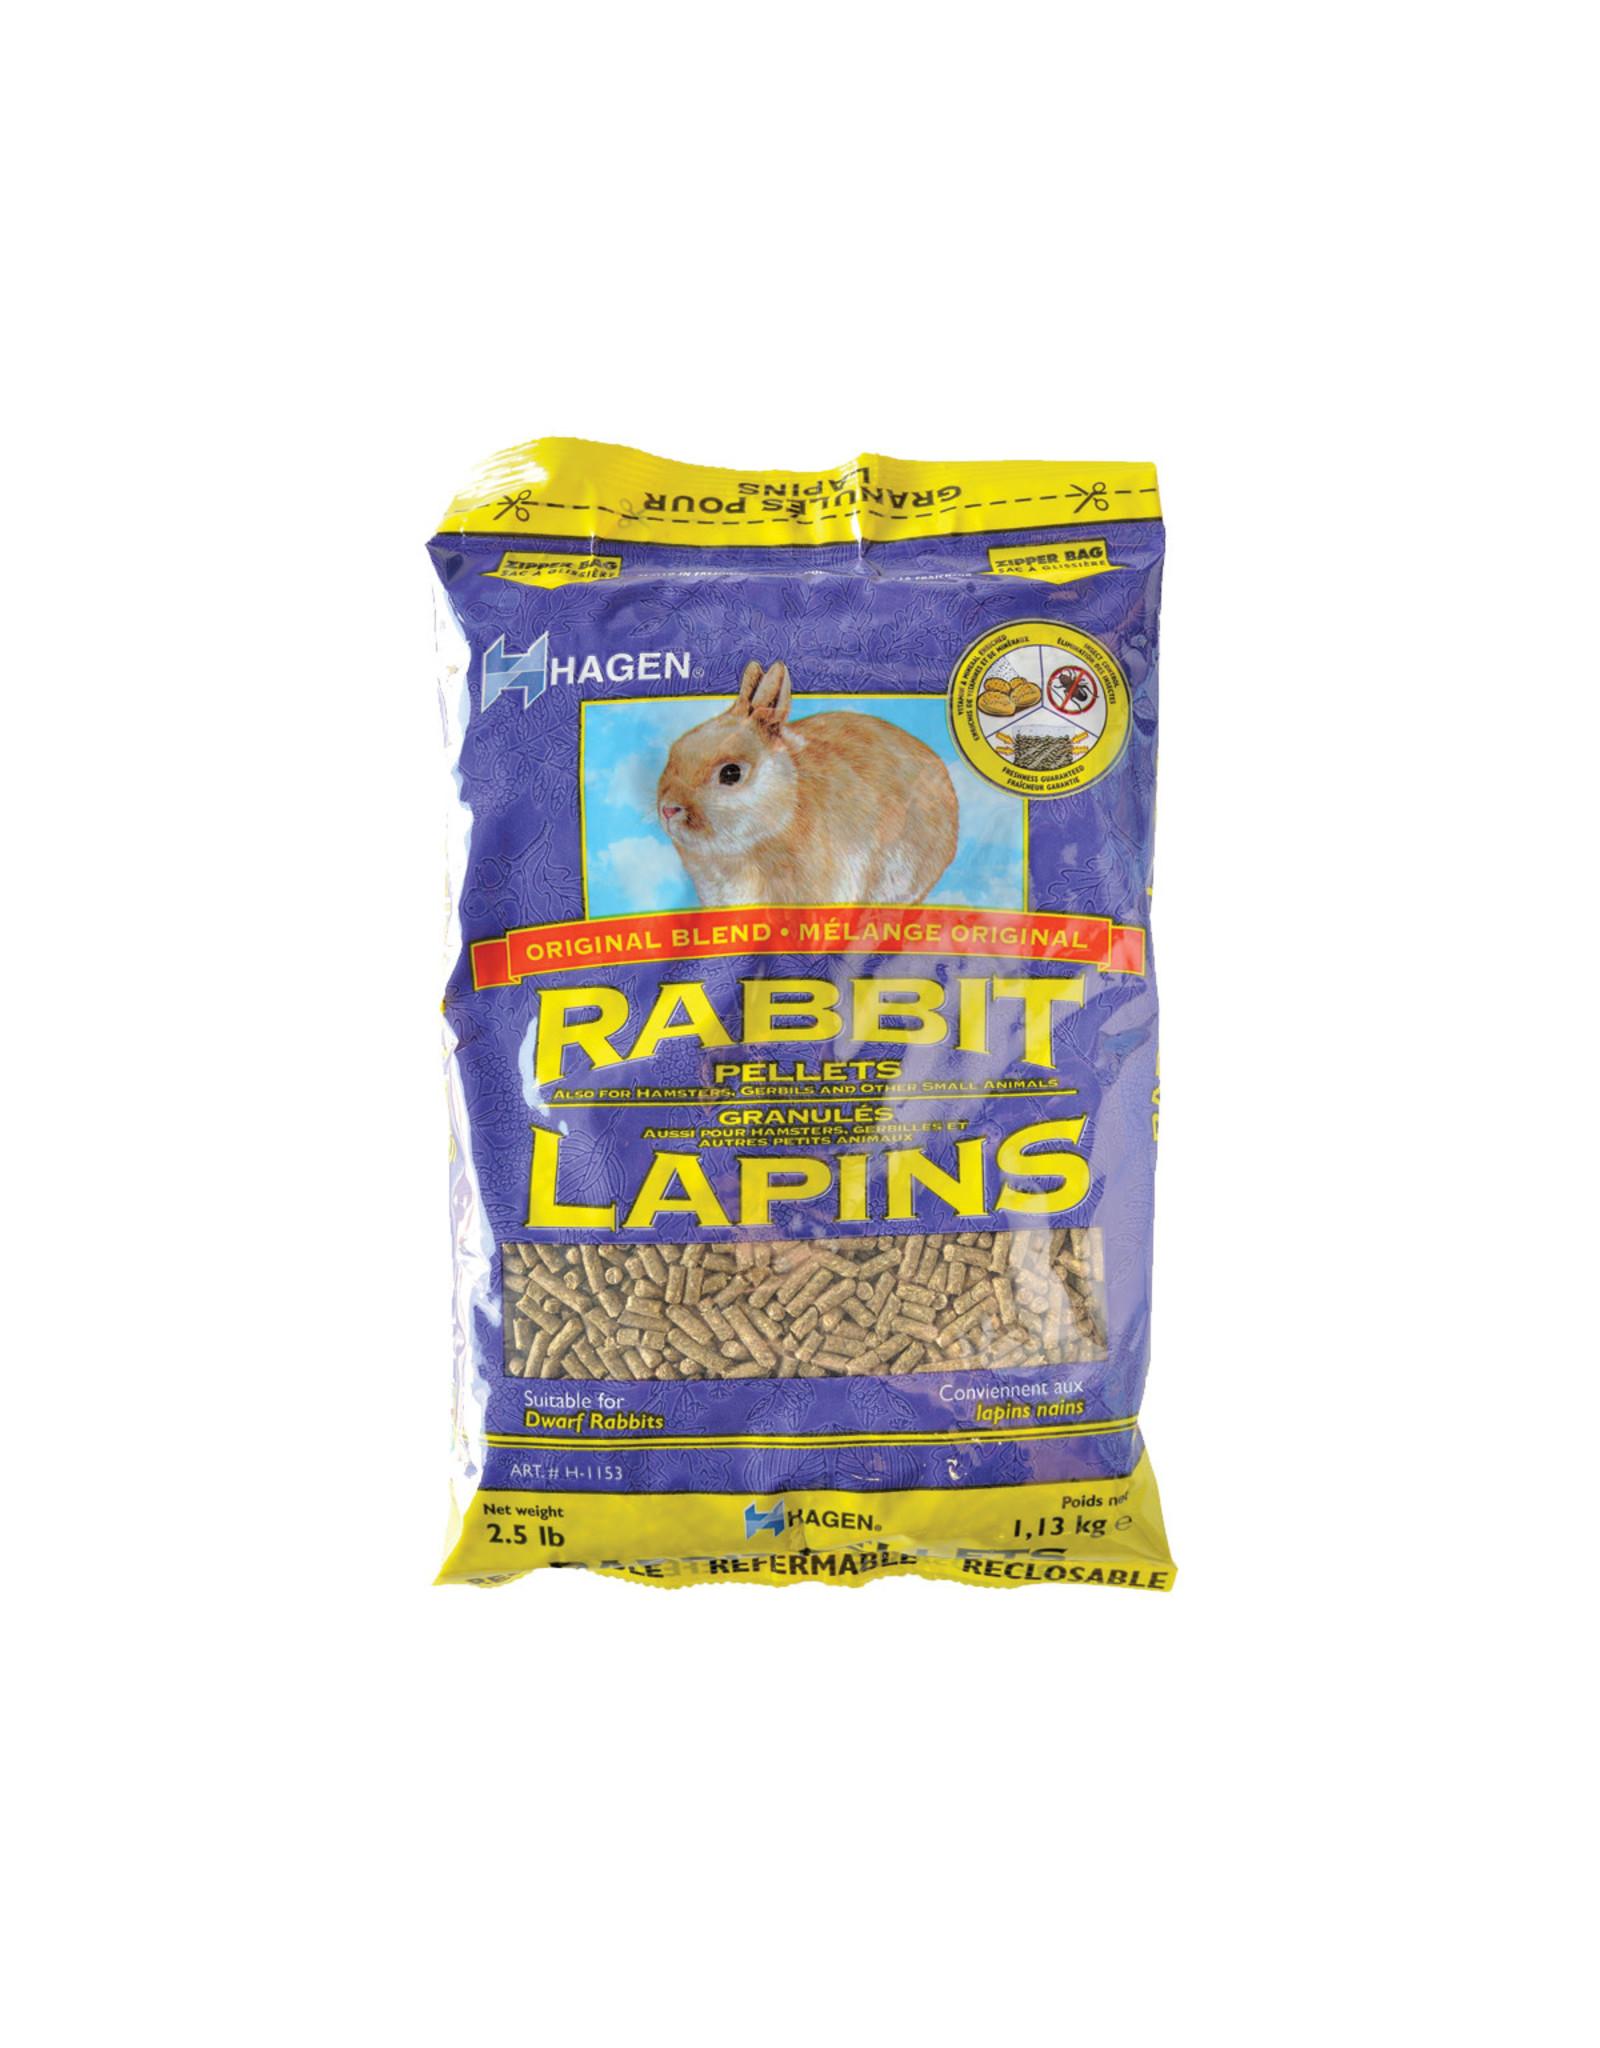 Hagen Hagen Rabbit Pellets - 1.13 kg (2.5 lbs)